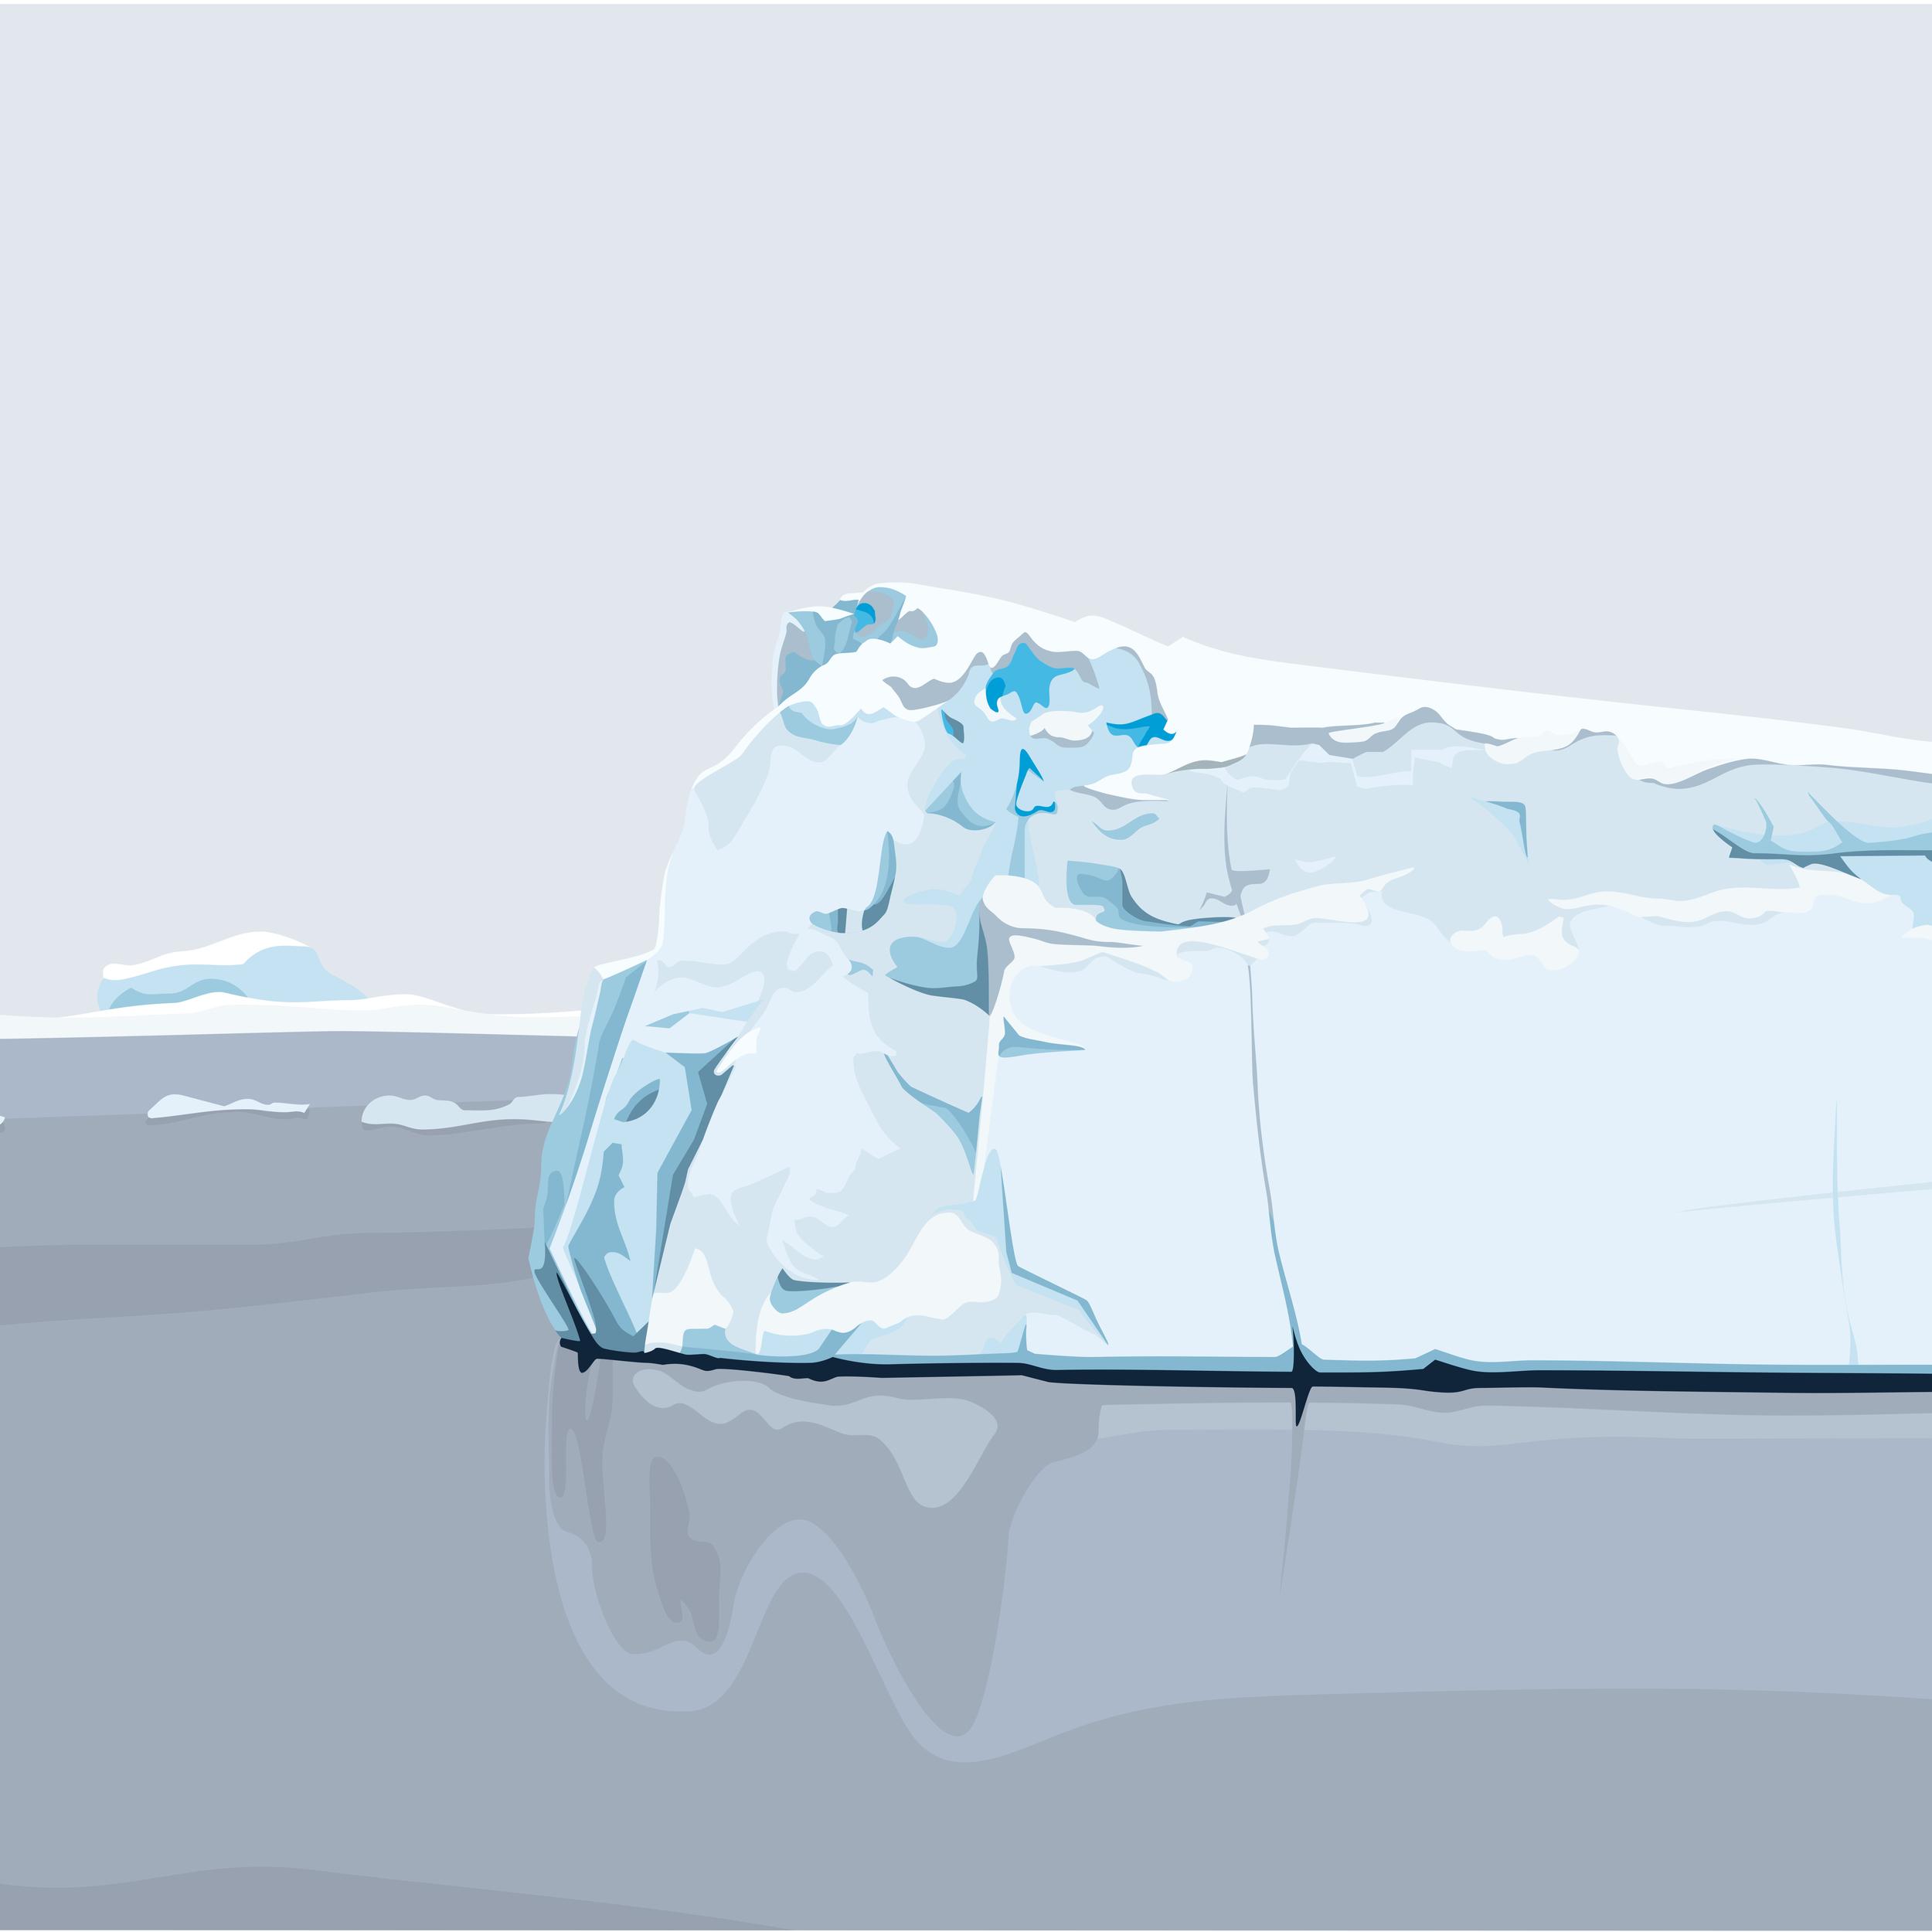 EXP_28 LAY ICESCAPE_Universal_Fogra4.jpg